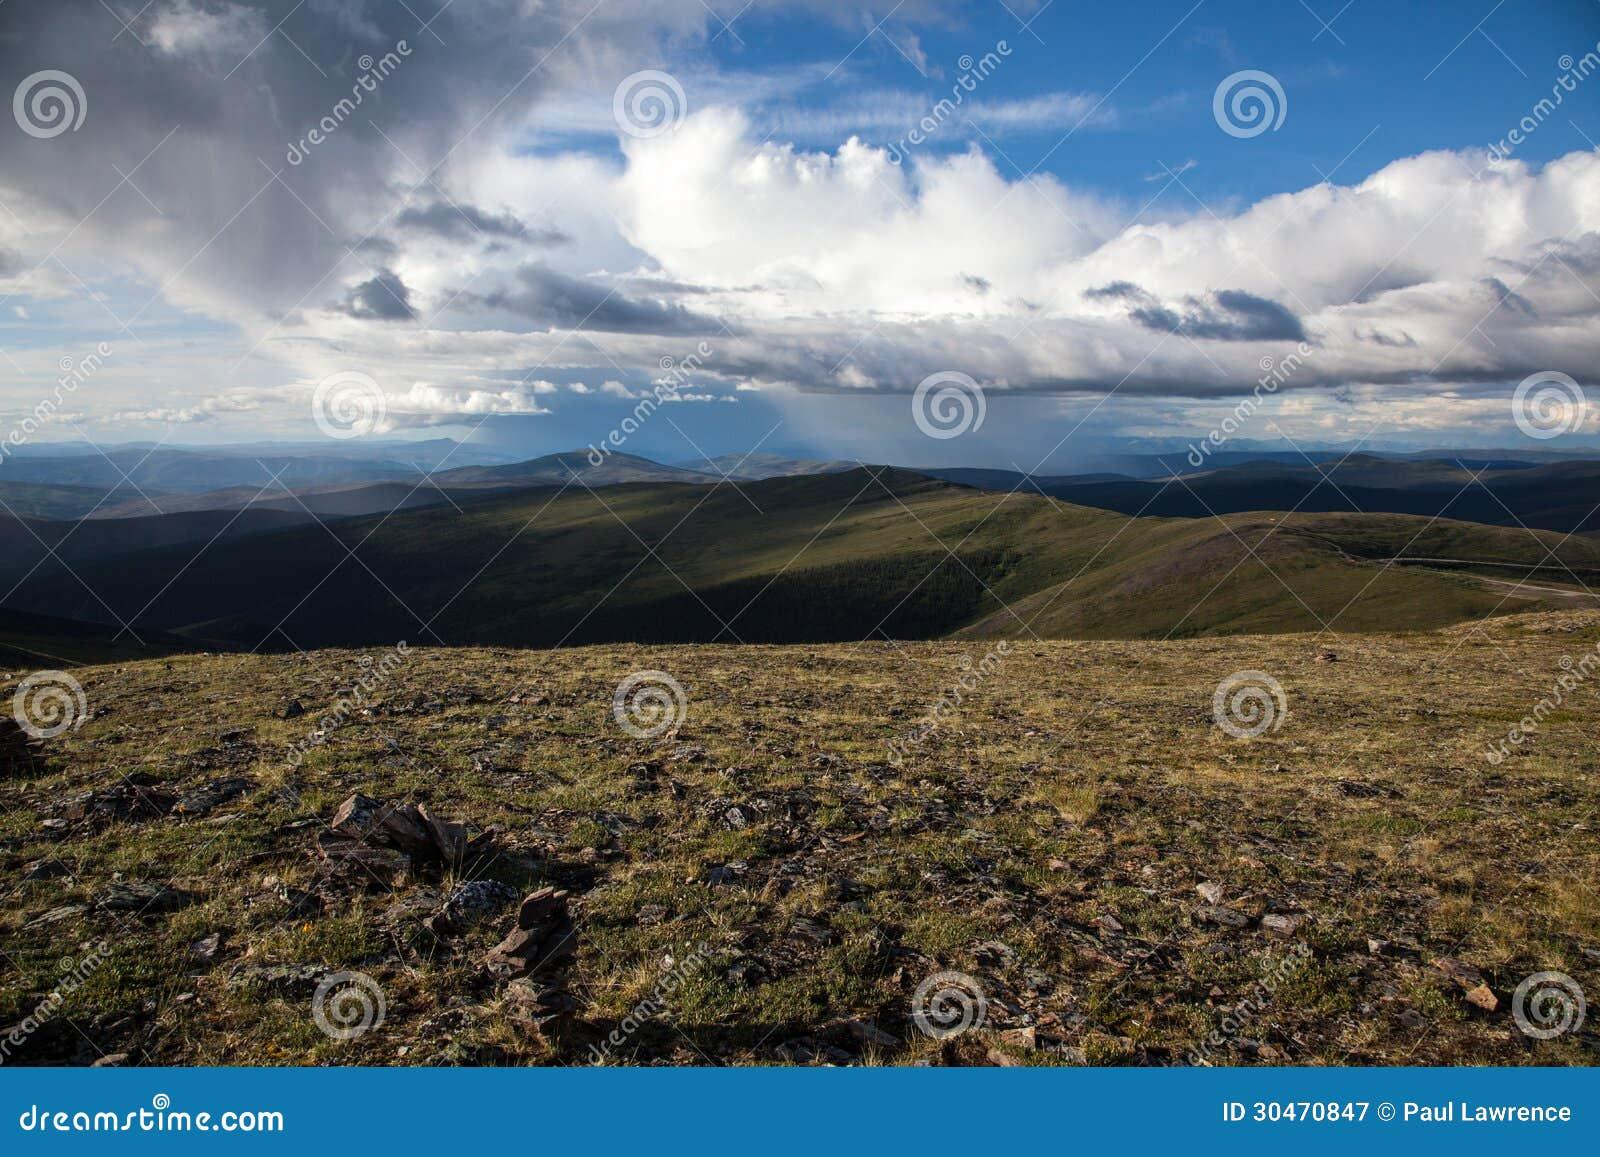 High Alpine Tundra